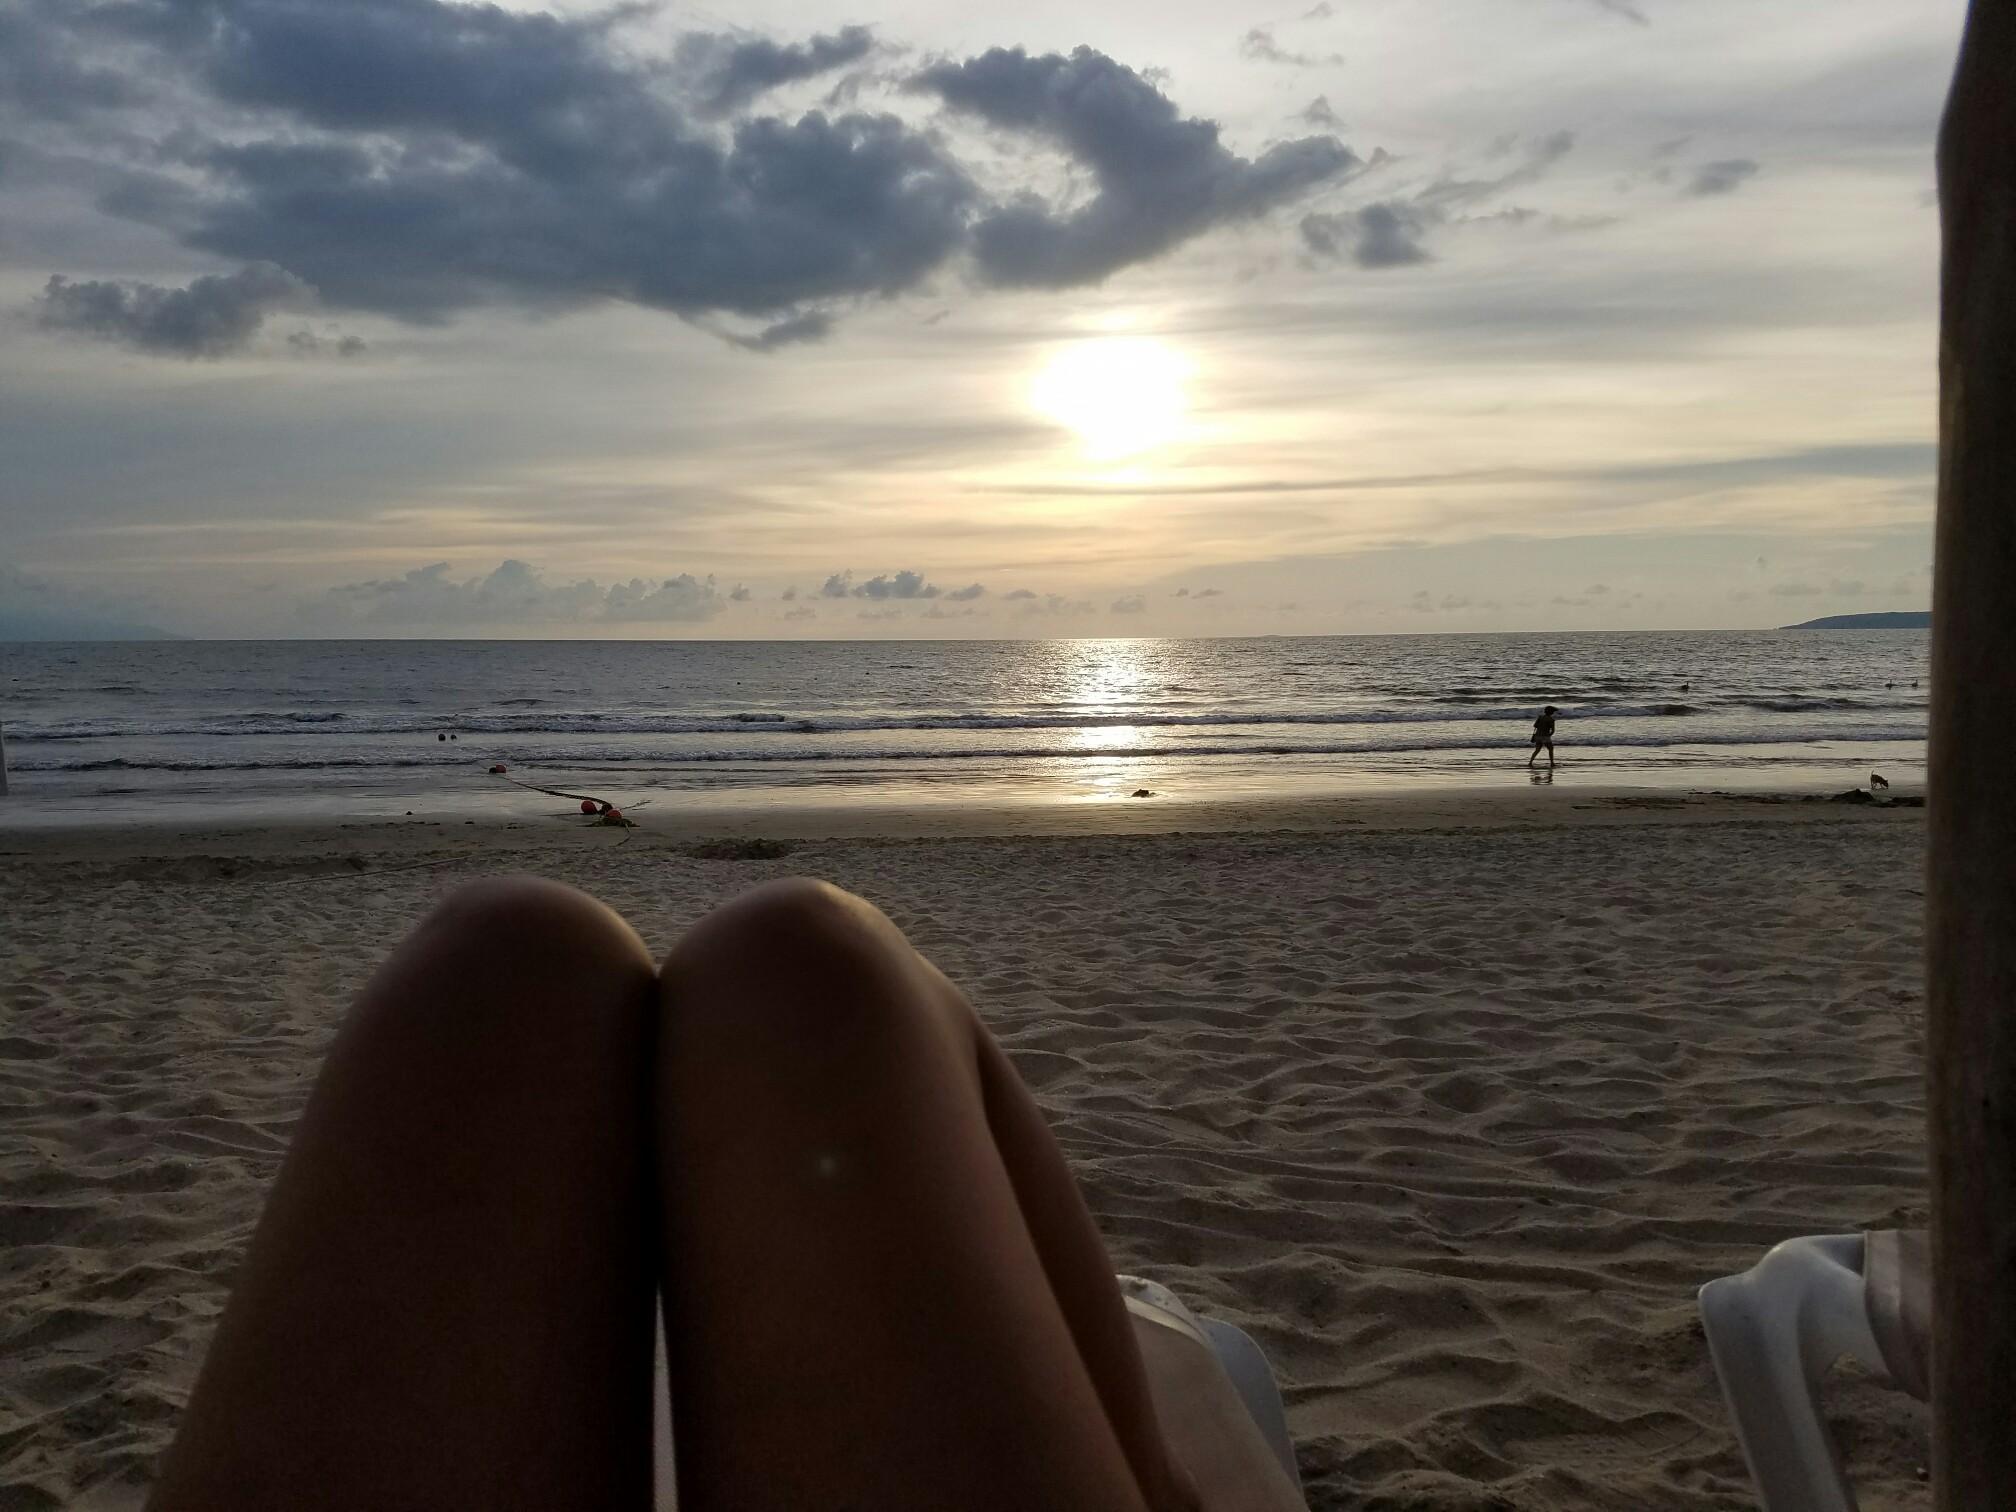 The Beautiful Beach before Sunset